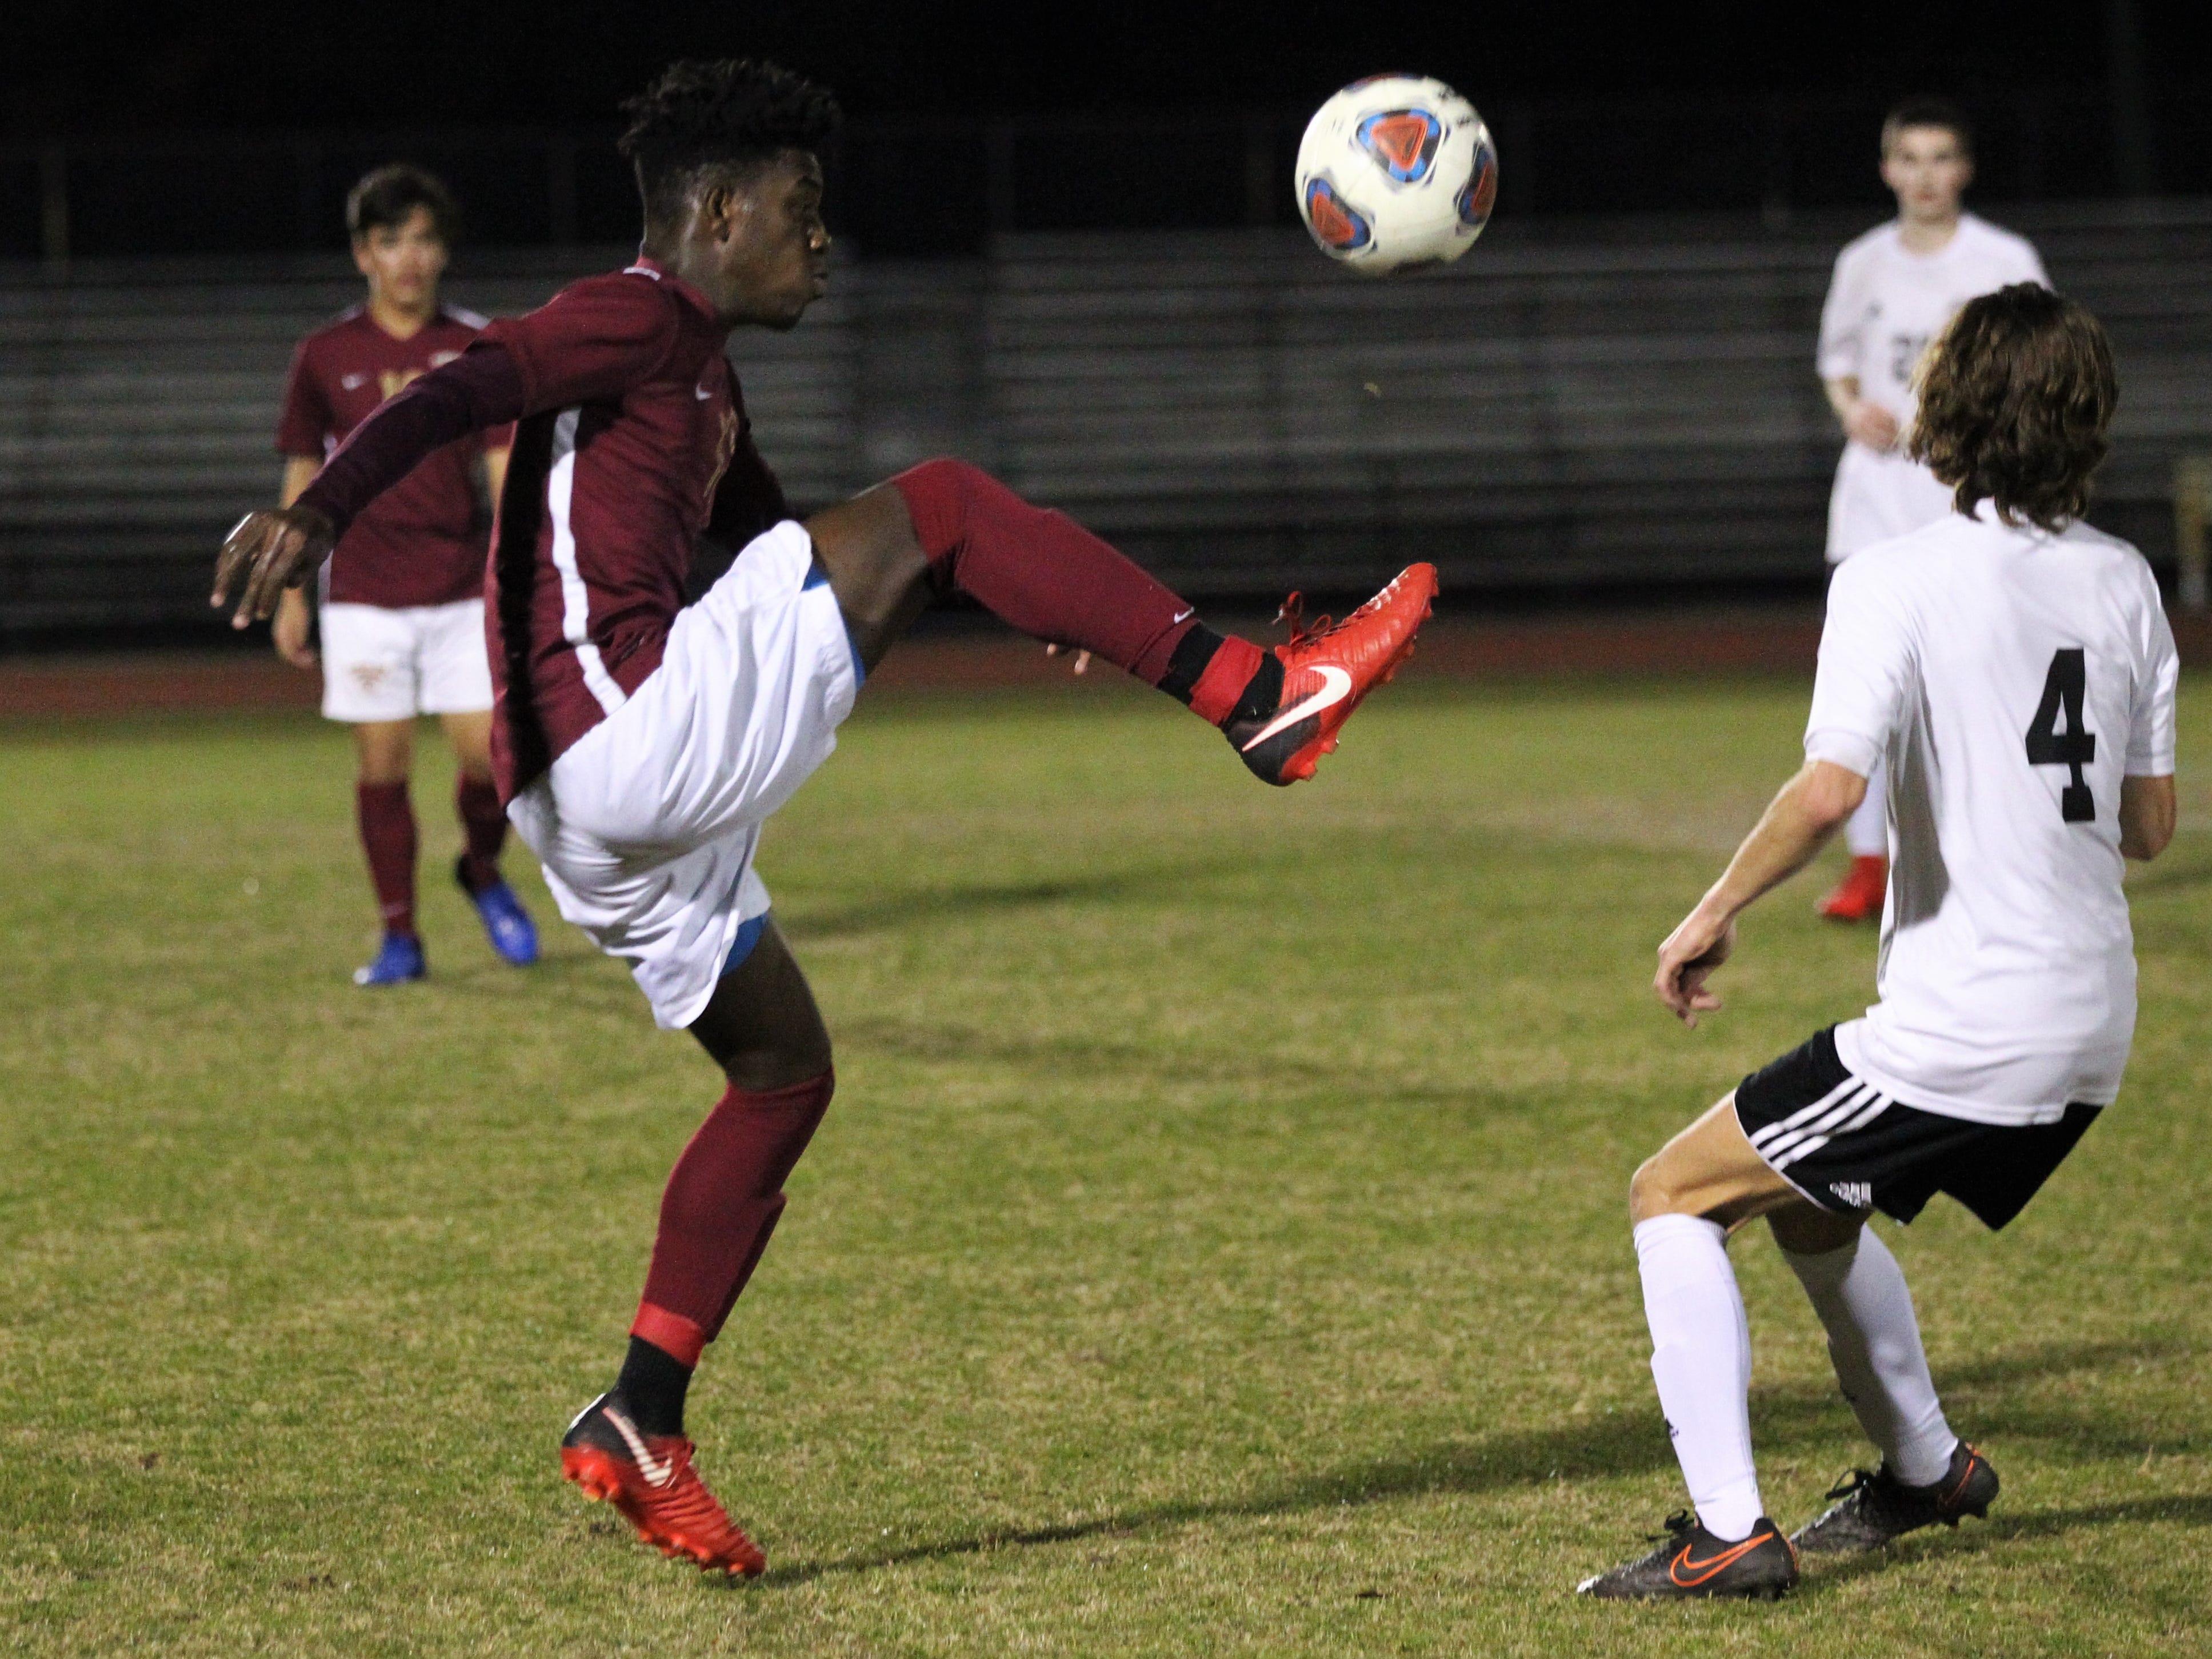 Florida High's passes a ball ahead as Florida High's boys soccer team beat South Walton 2-0 during a Region 1-2A quarterfinal on Feb. 6, 2018.